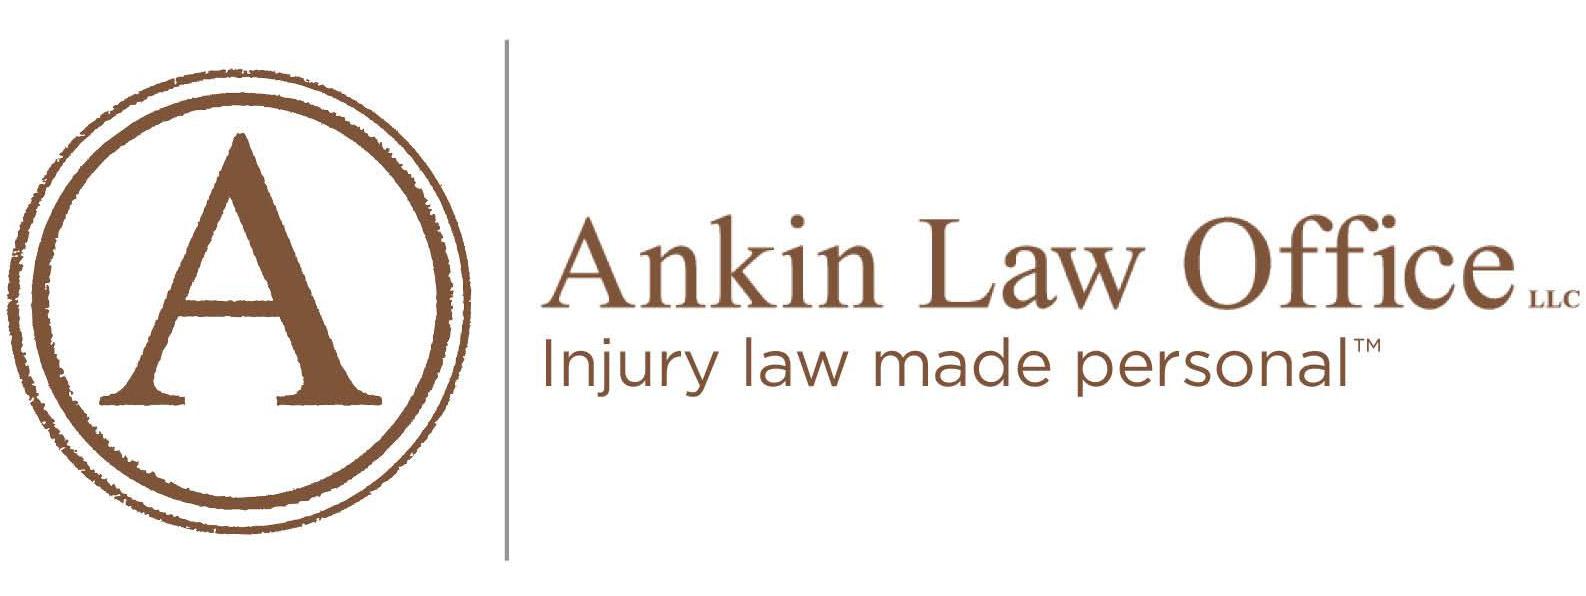 AnkinLaw